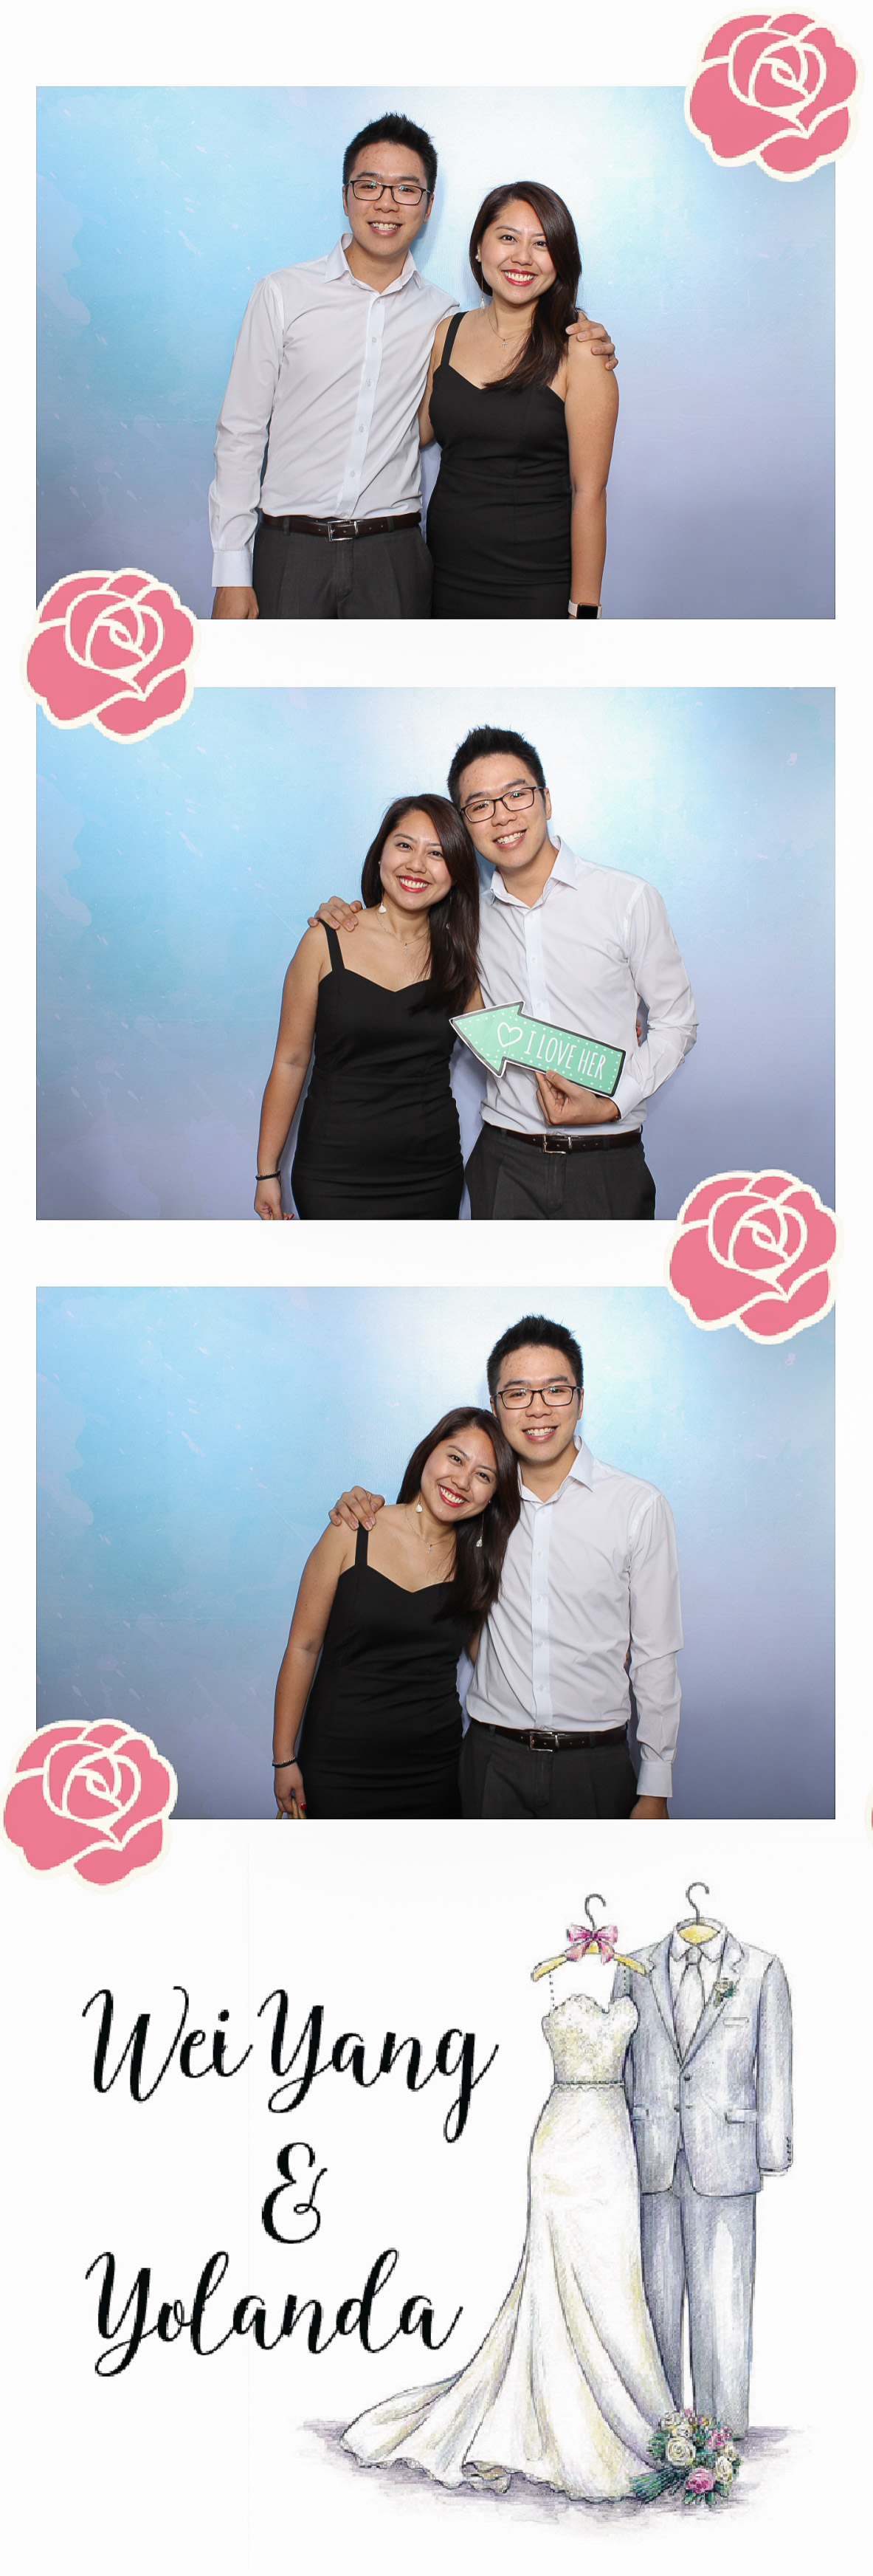 Photobooth 1706-11